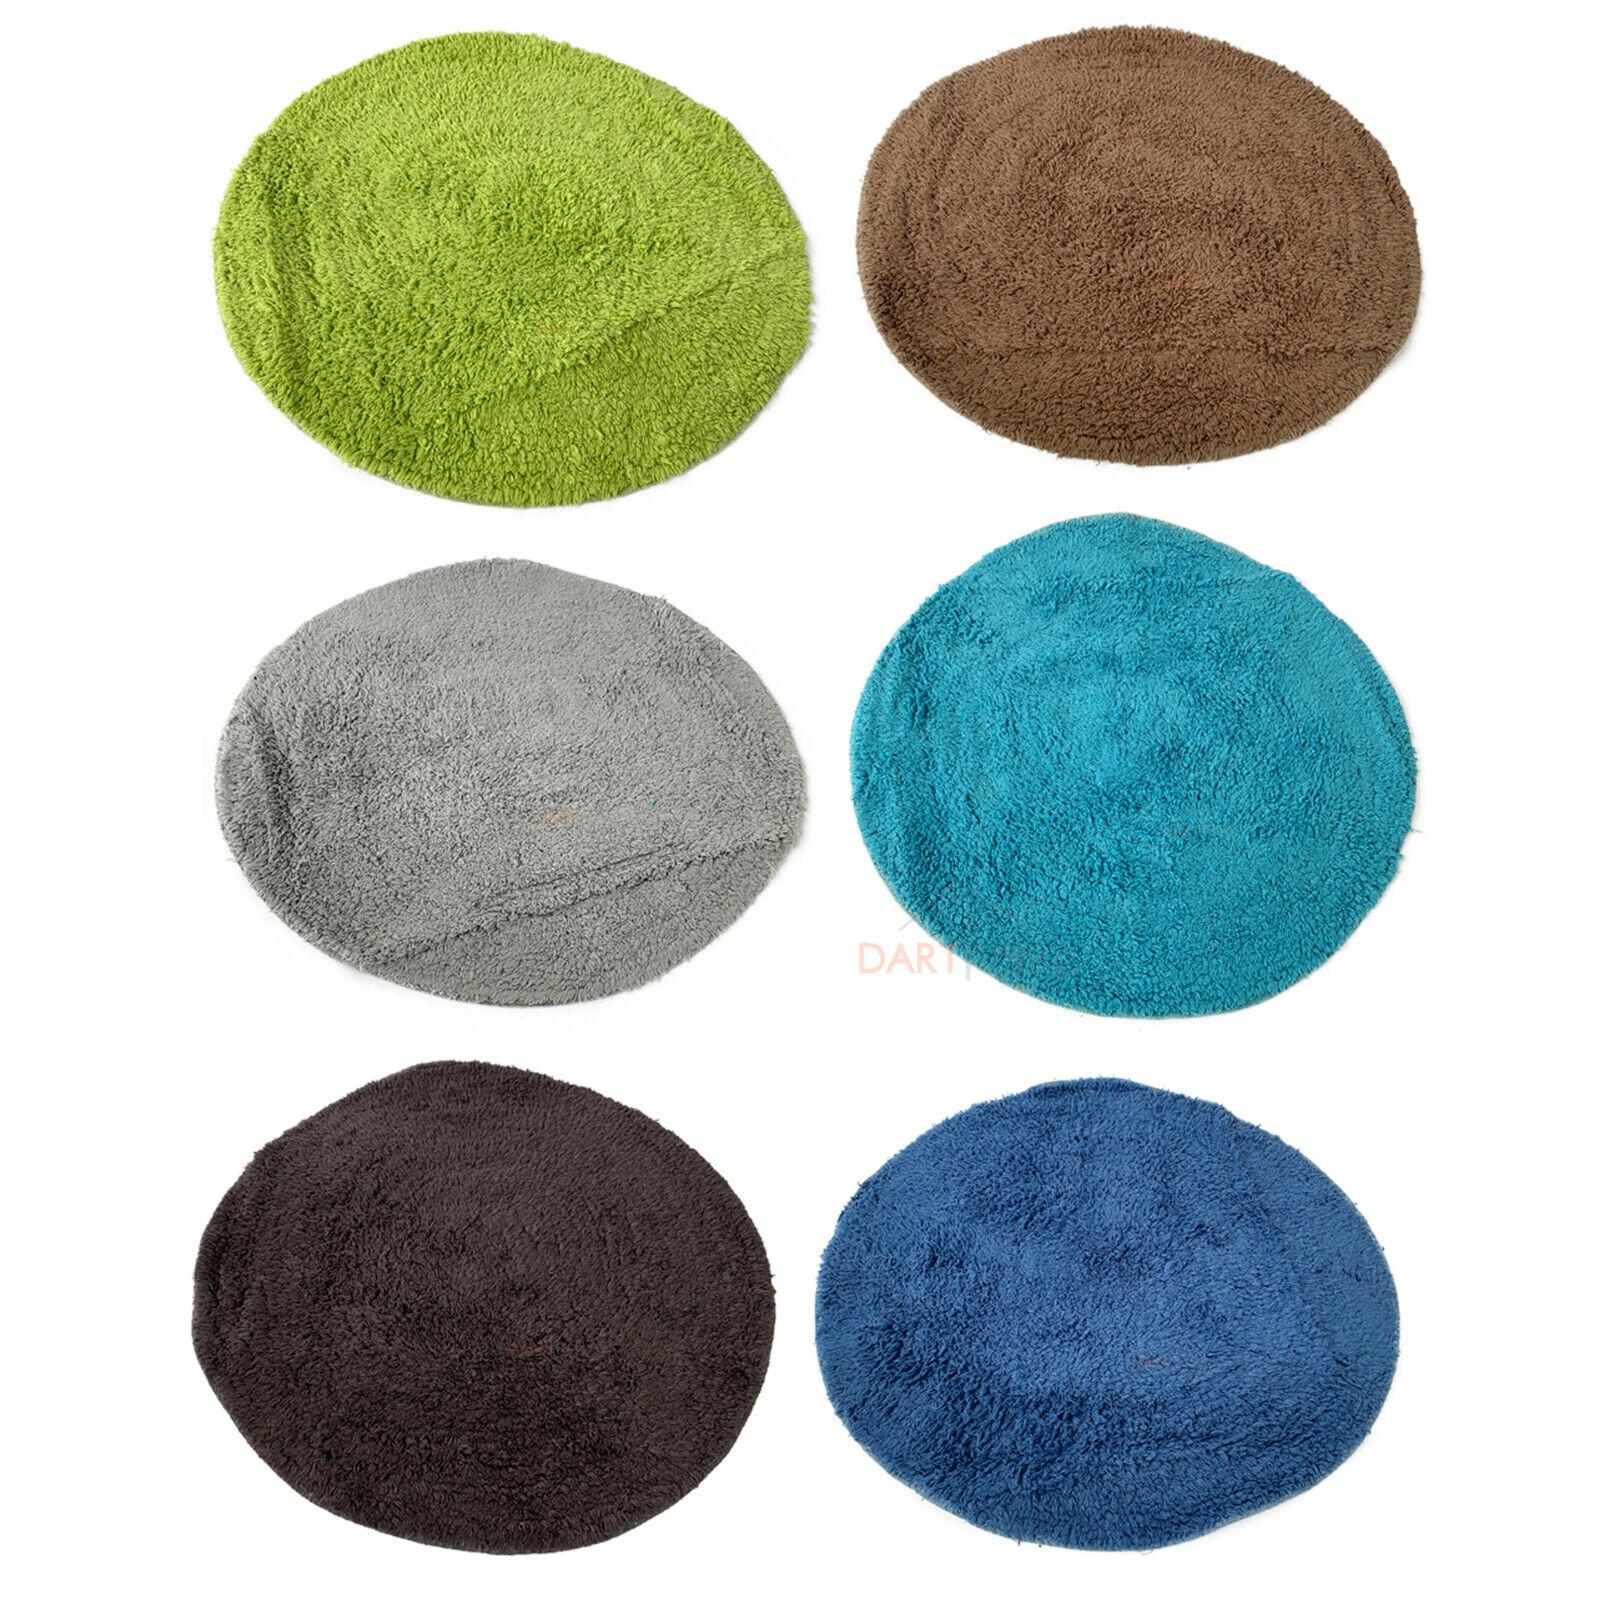 Round Coloured Cotton Tufted Absorbant Bathroom Shower Bath Rug Non-Slip Mats